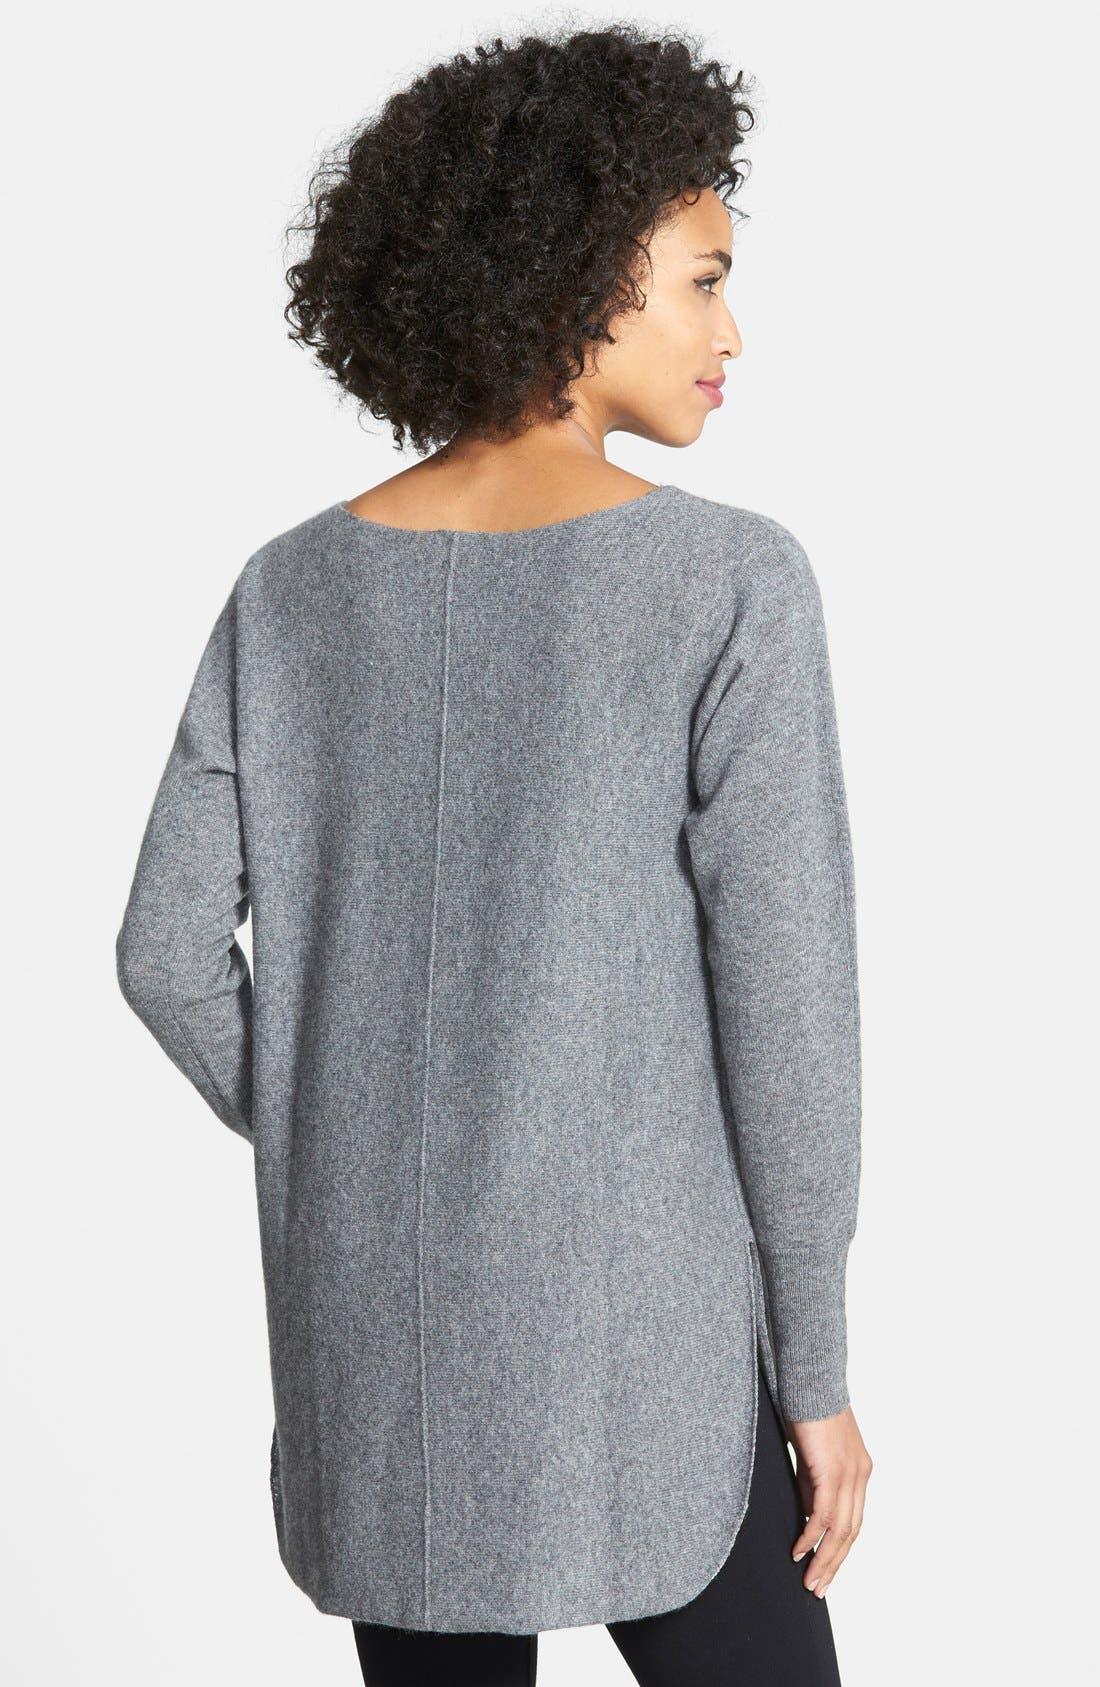 Cashmere Shirttail Sweater,                             Alternate thumbnail 2, color,                             Medium Heather Grey